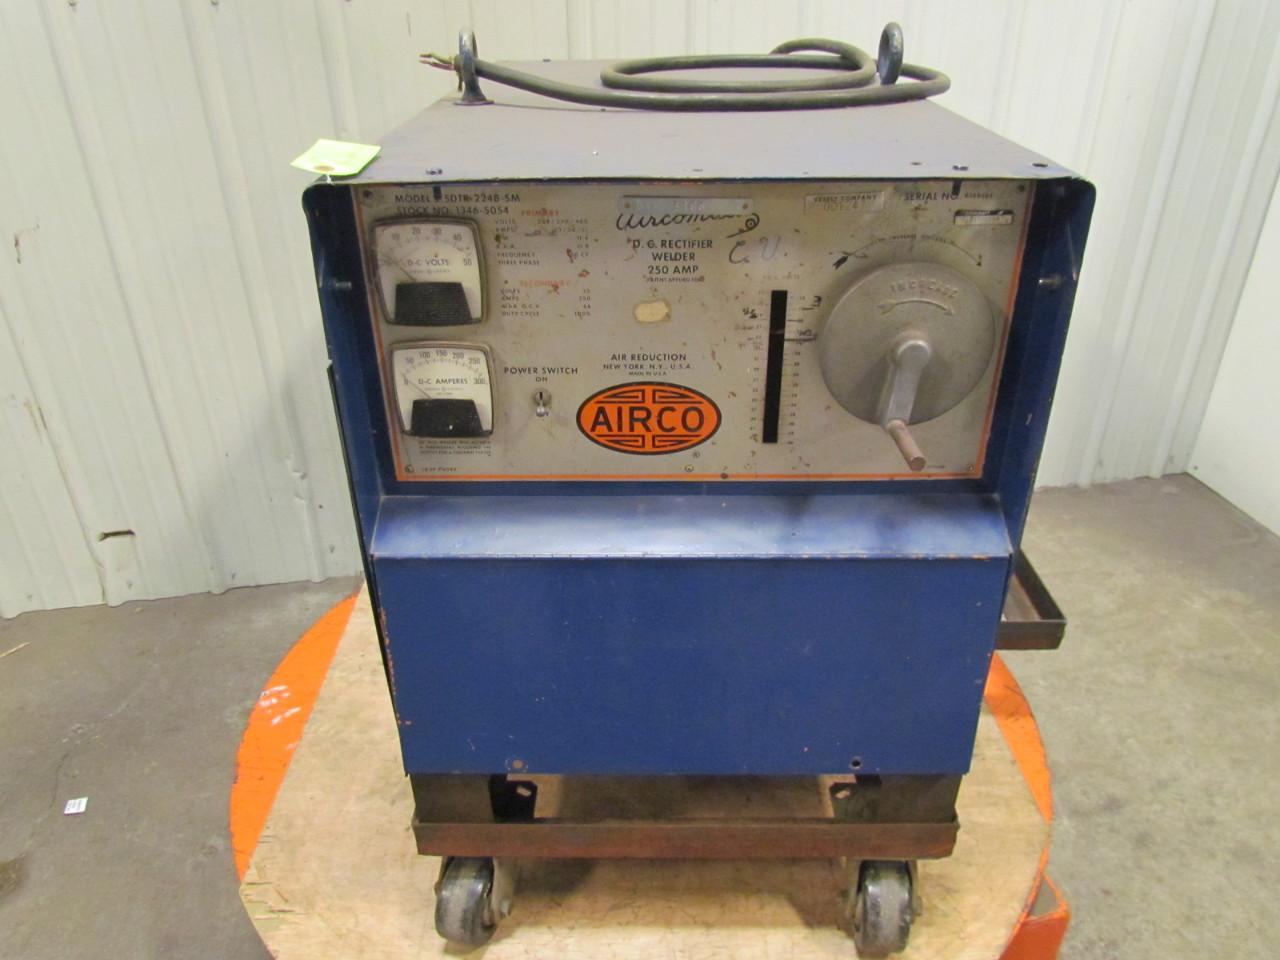 airco aircomatic 250a dc rectifier welder 208 230 460v 3ph. Black Bedroom Furniture Sets. Home Design Ideas